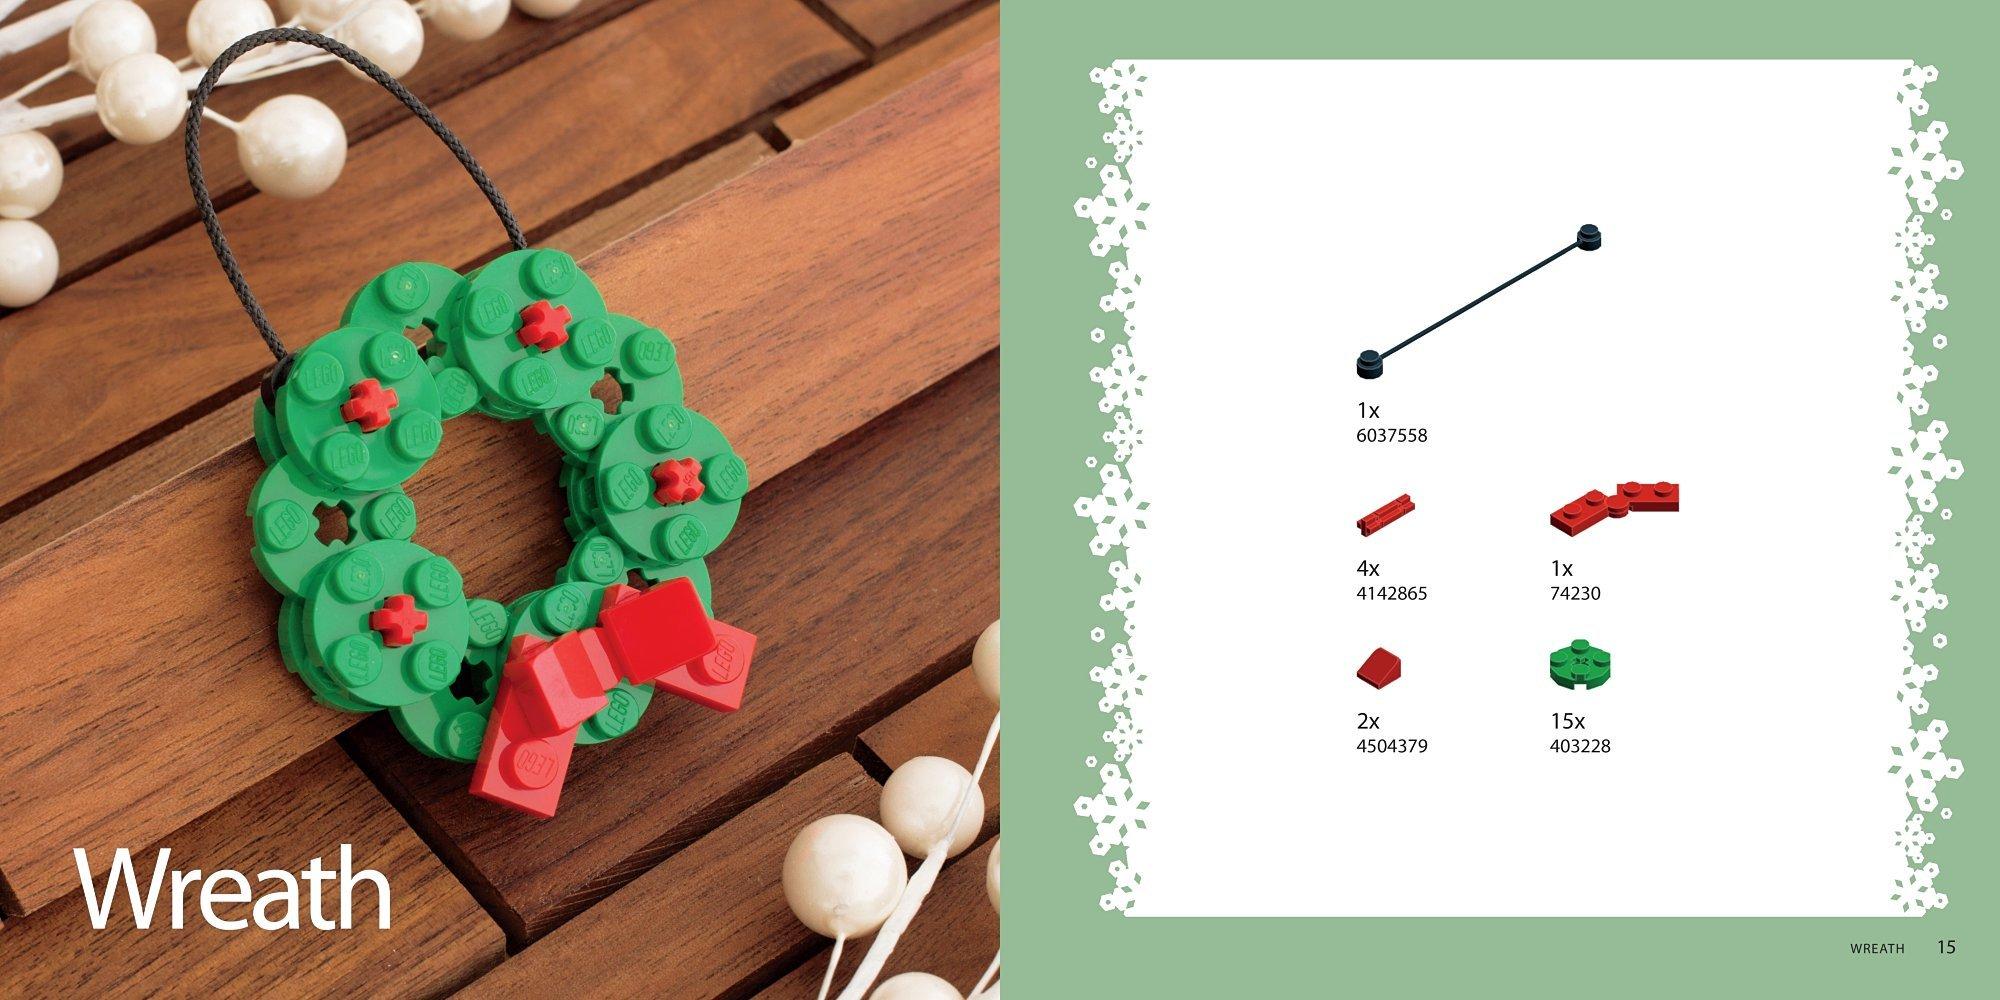 Camera christmas ornaments - The Lego Christmas Ornaments Book 15 Designs To Spread Holiday Cheer Chris Mcveigh 9781593277666 Amazon Com Books